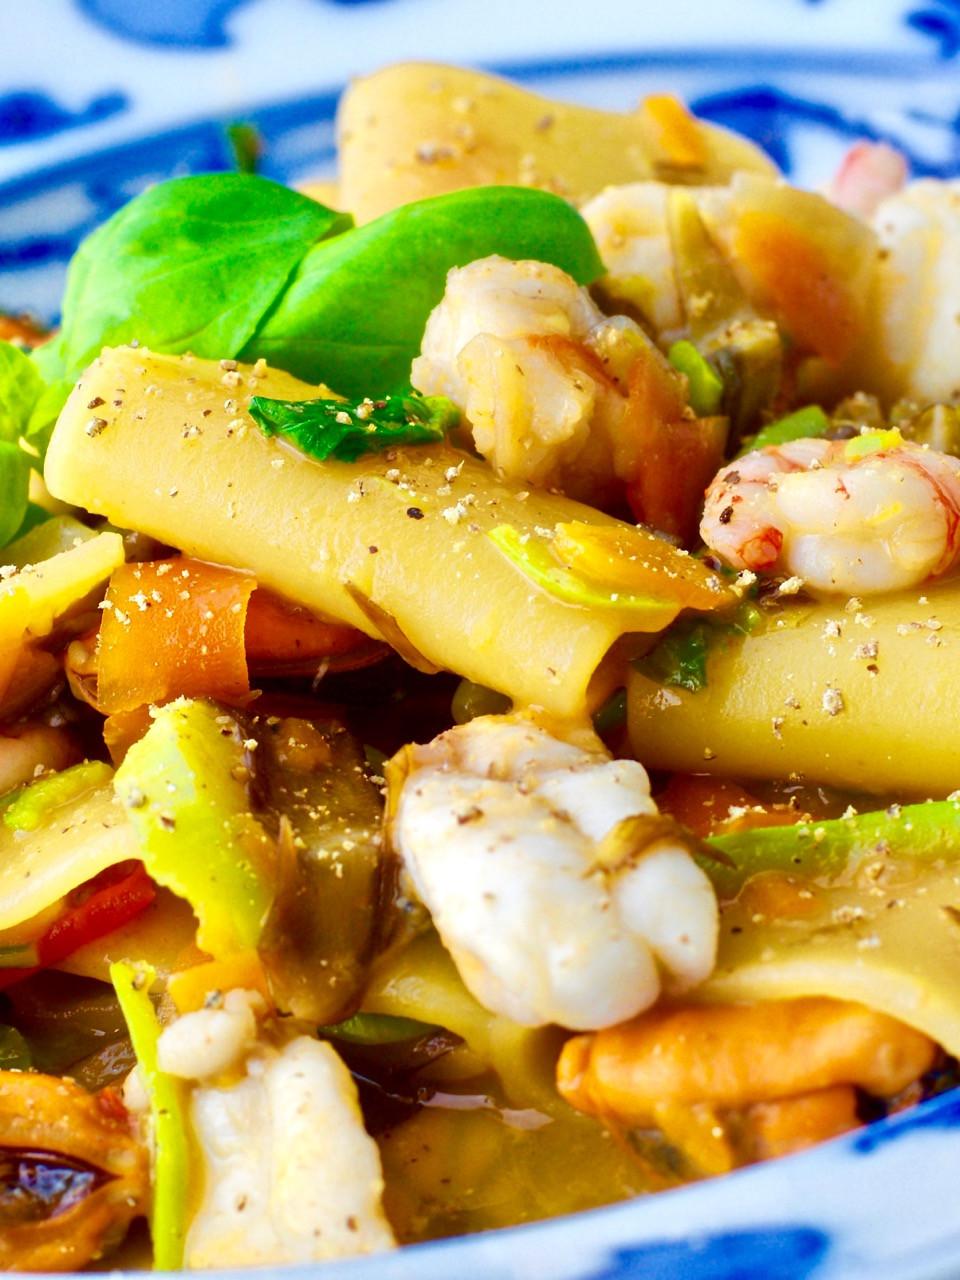 Schiaffoni con verdure e pesce - Schiaffoni with vegetables and fish